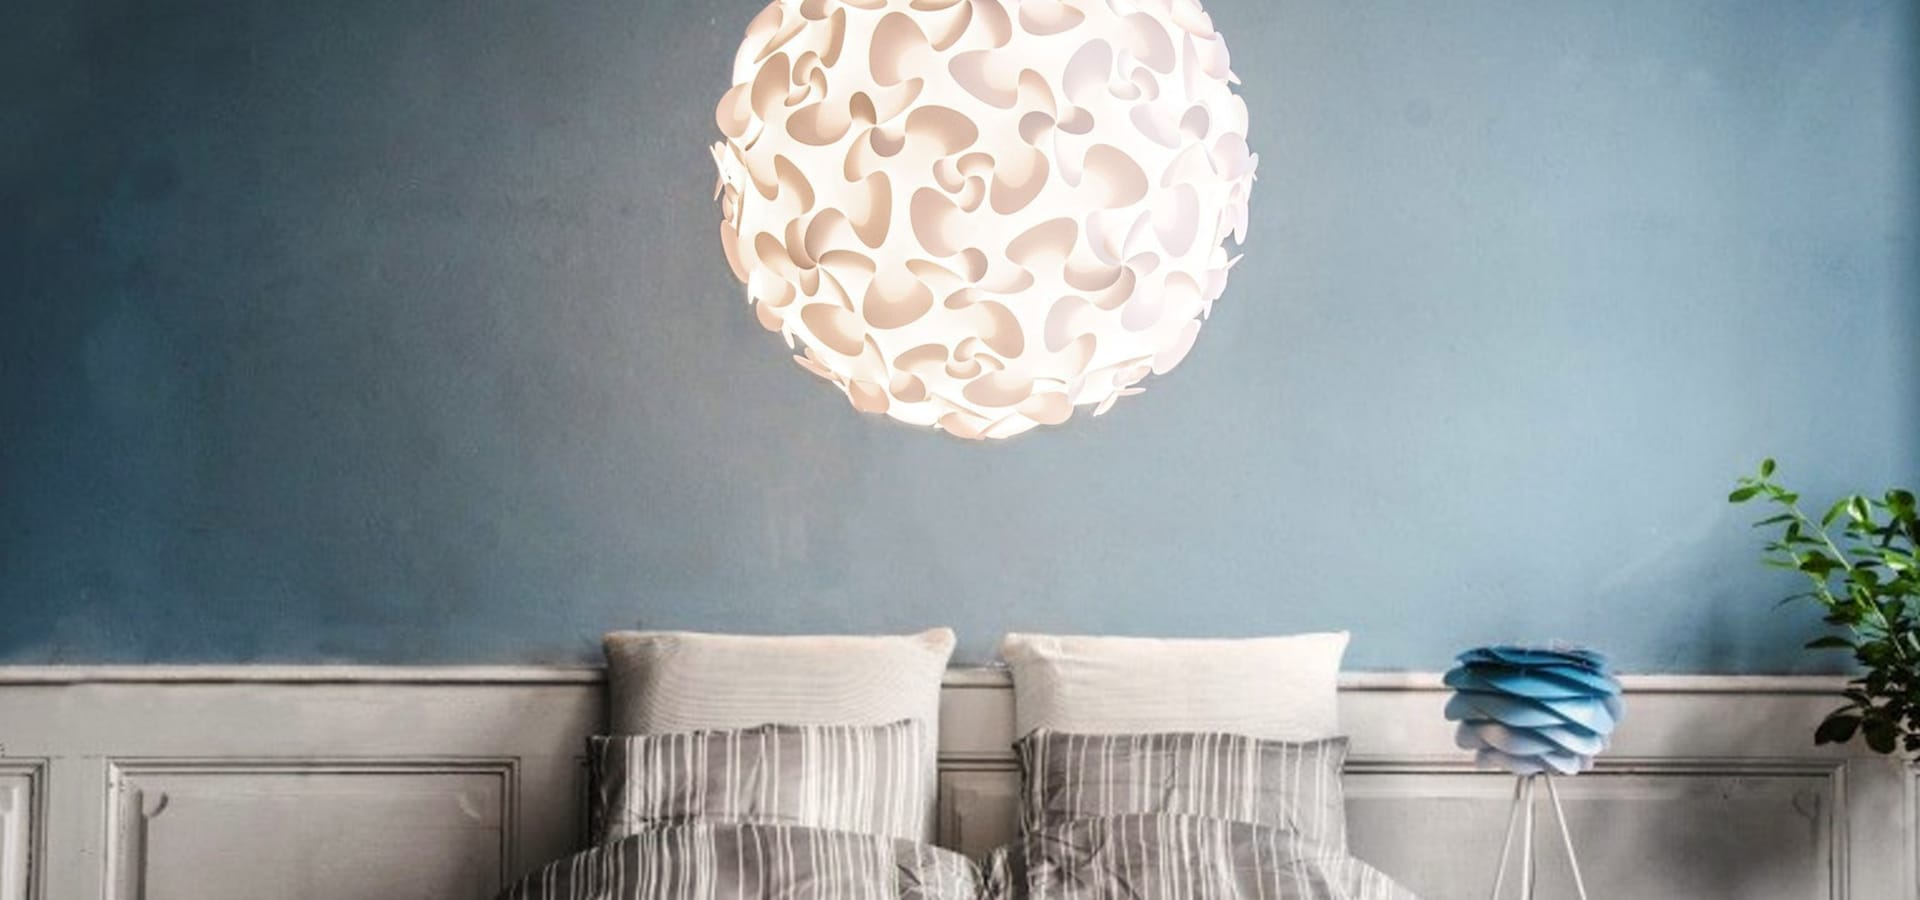 lorenzo radaelli designer in m nchen homify. Black Bedroom Furniture Sets. Home Design Ideas